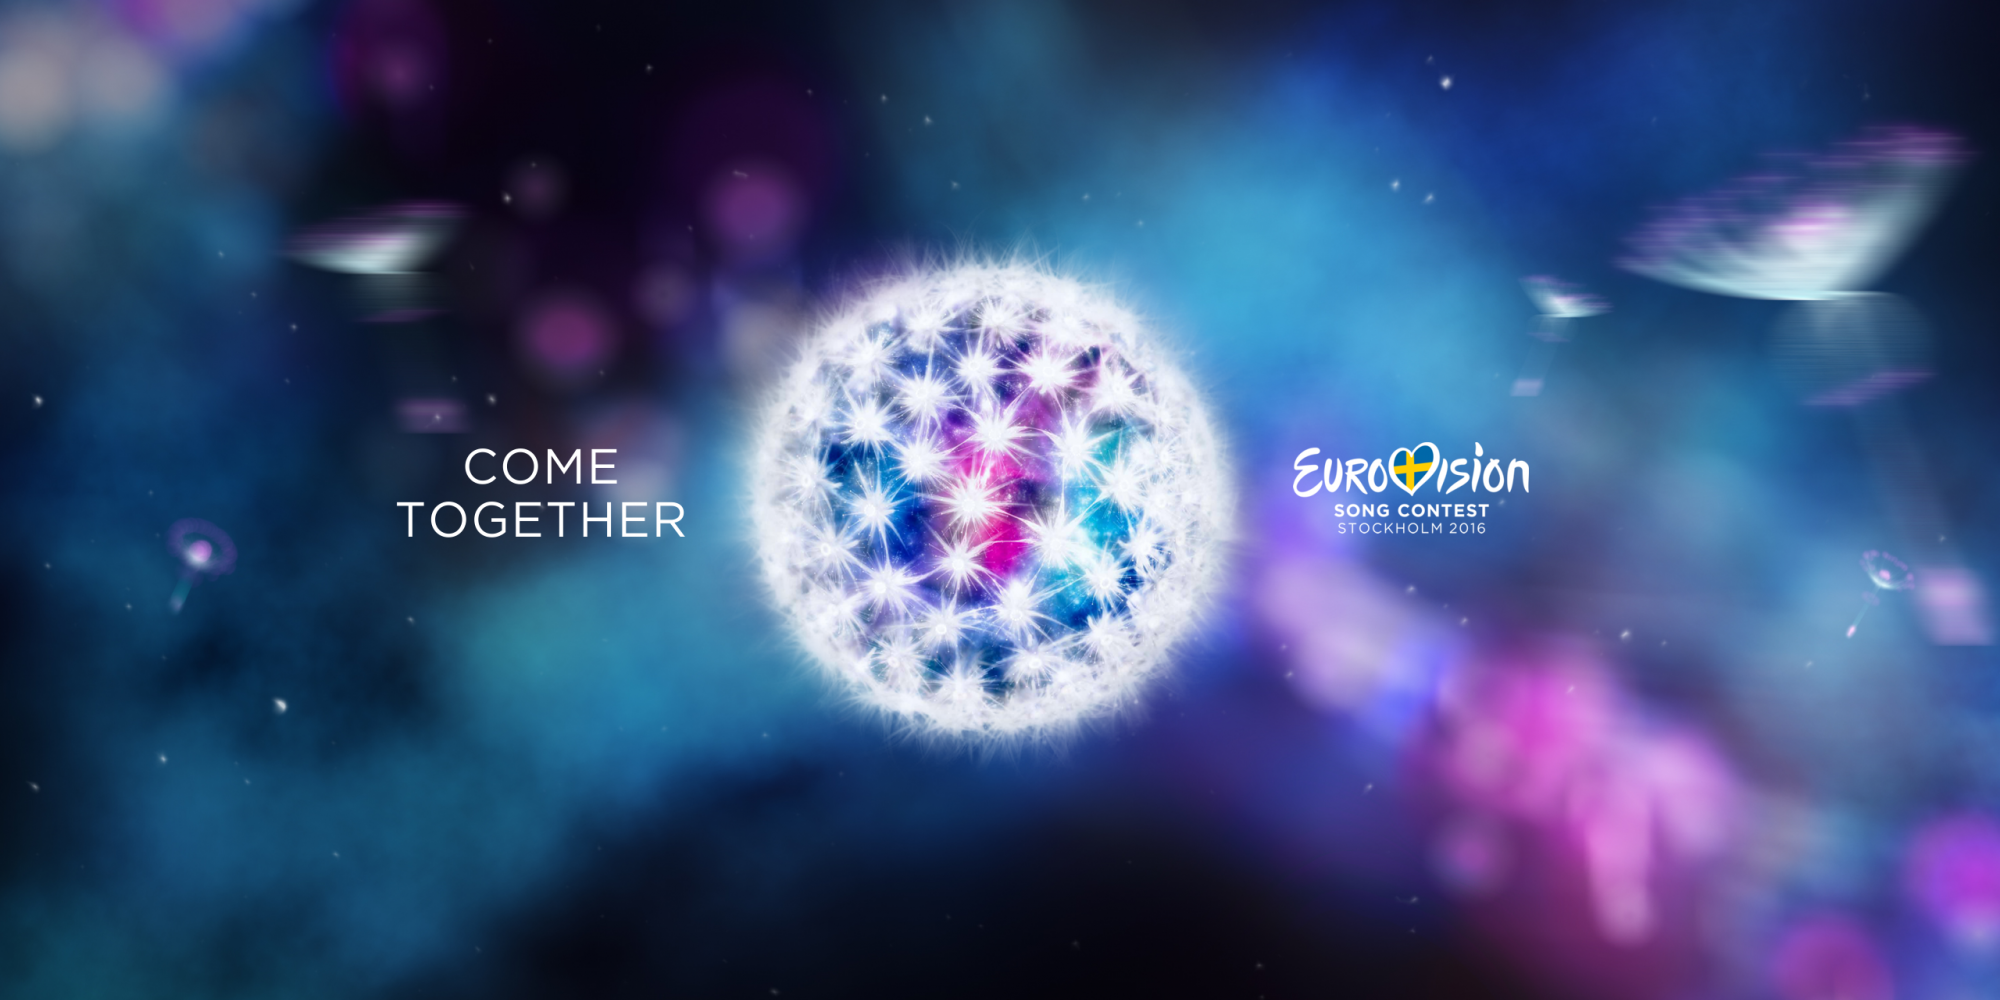 Image: Eurovisoon Song Contest 2016 (c) Eurovision